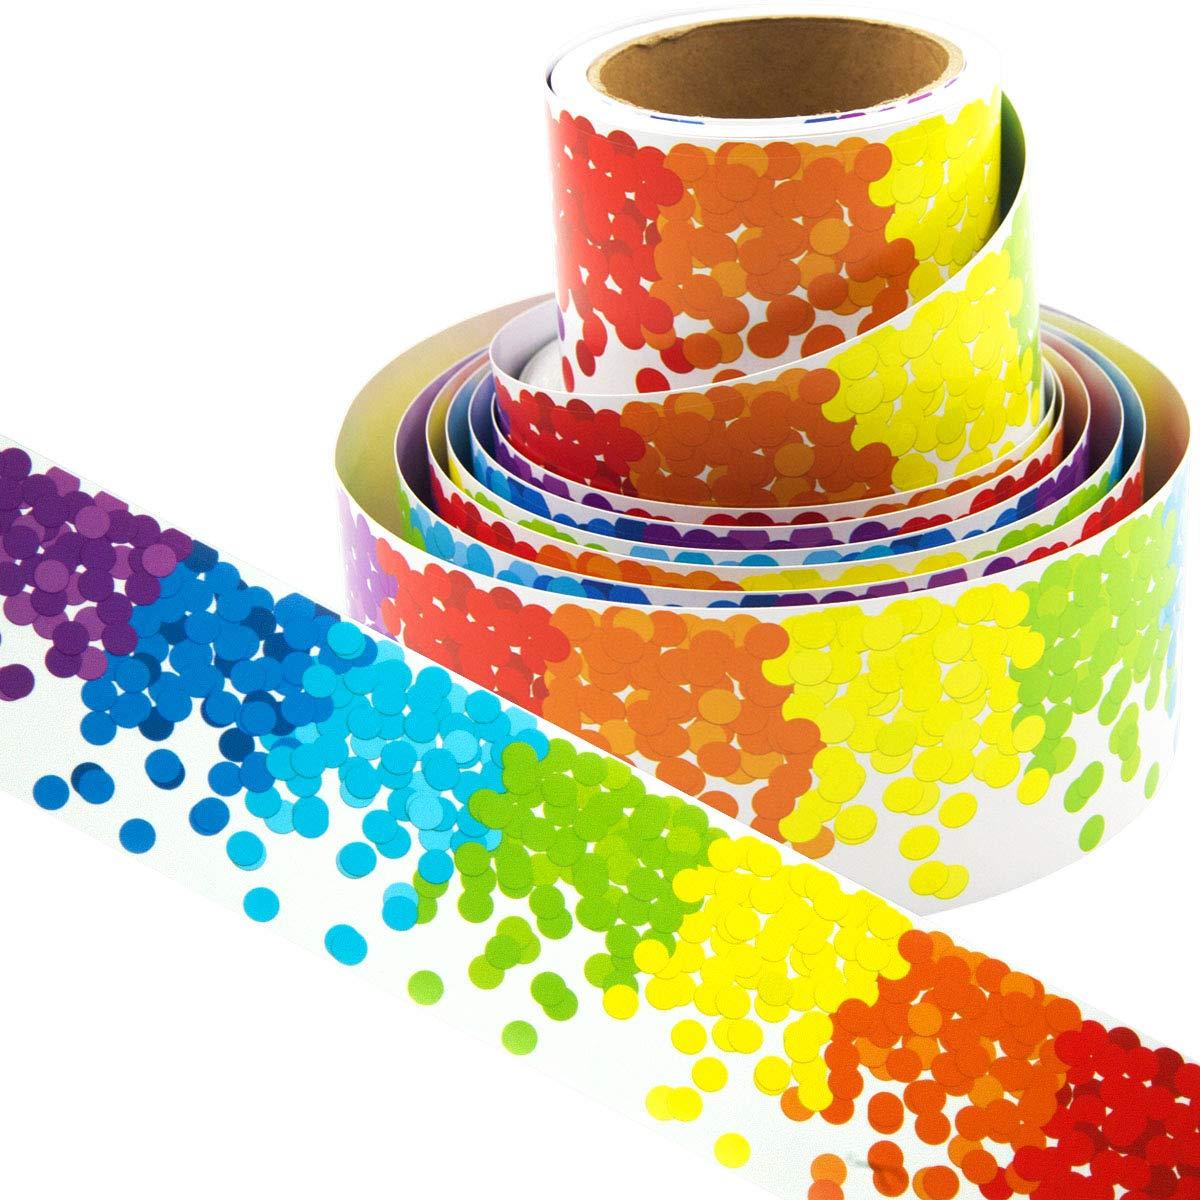 Bulletin Board Borders Rainbow Confetti-Themed Border for Classroom Decoration 36ft